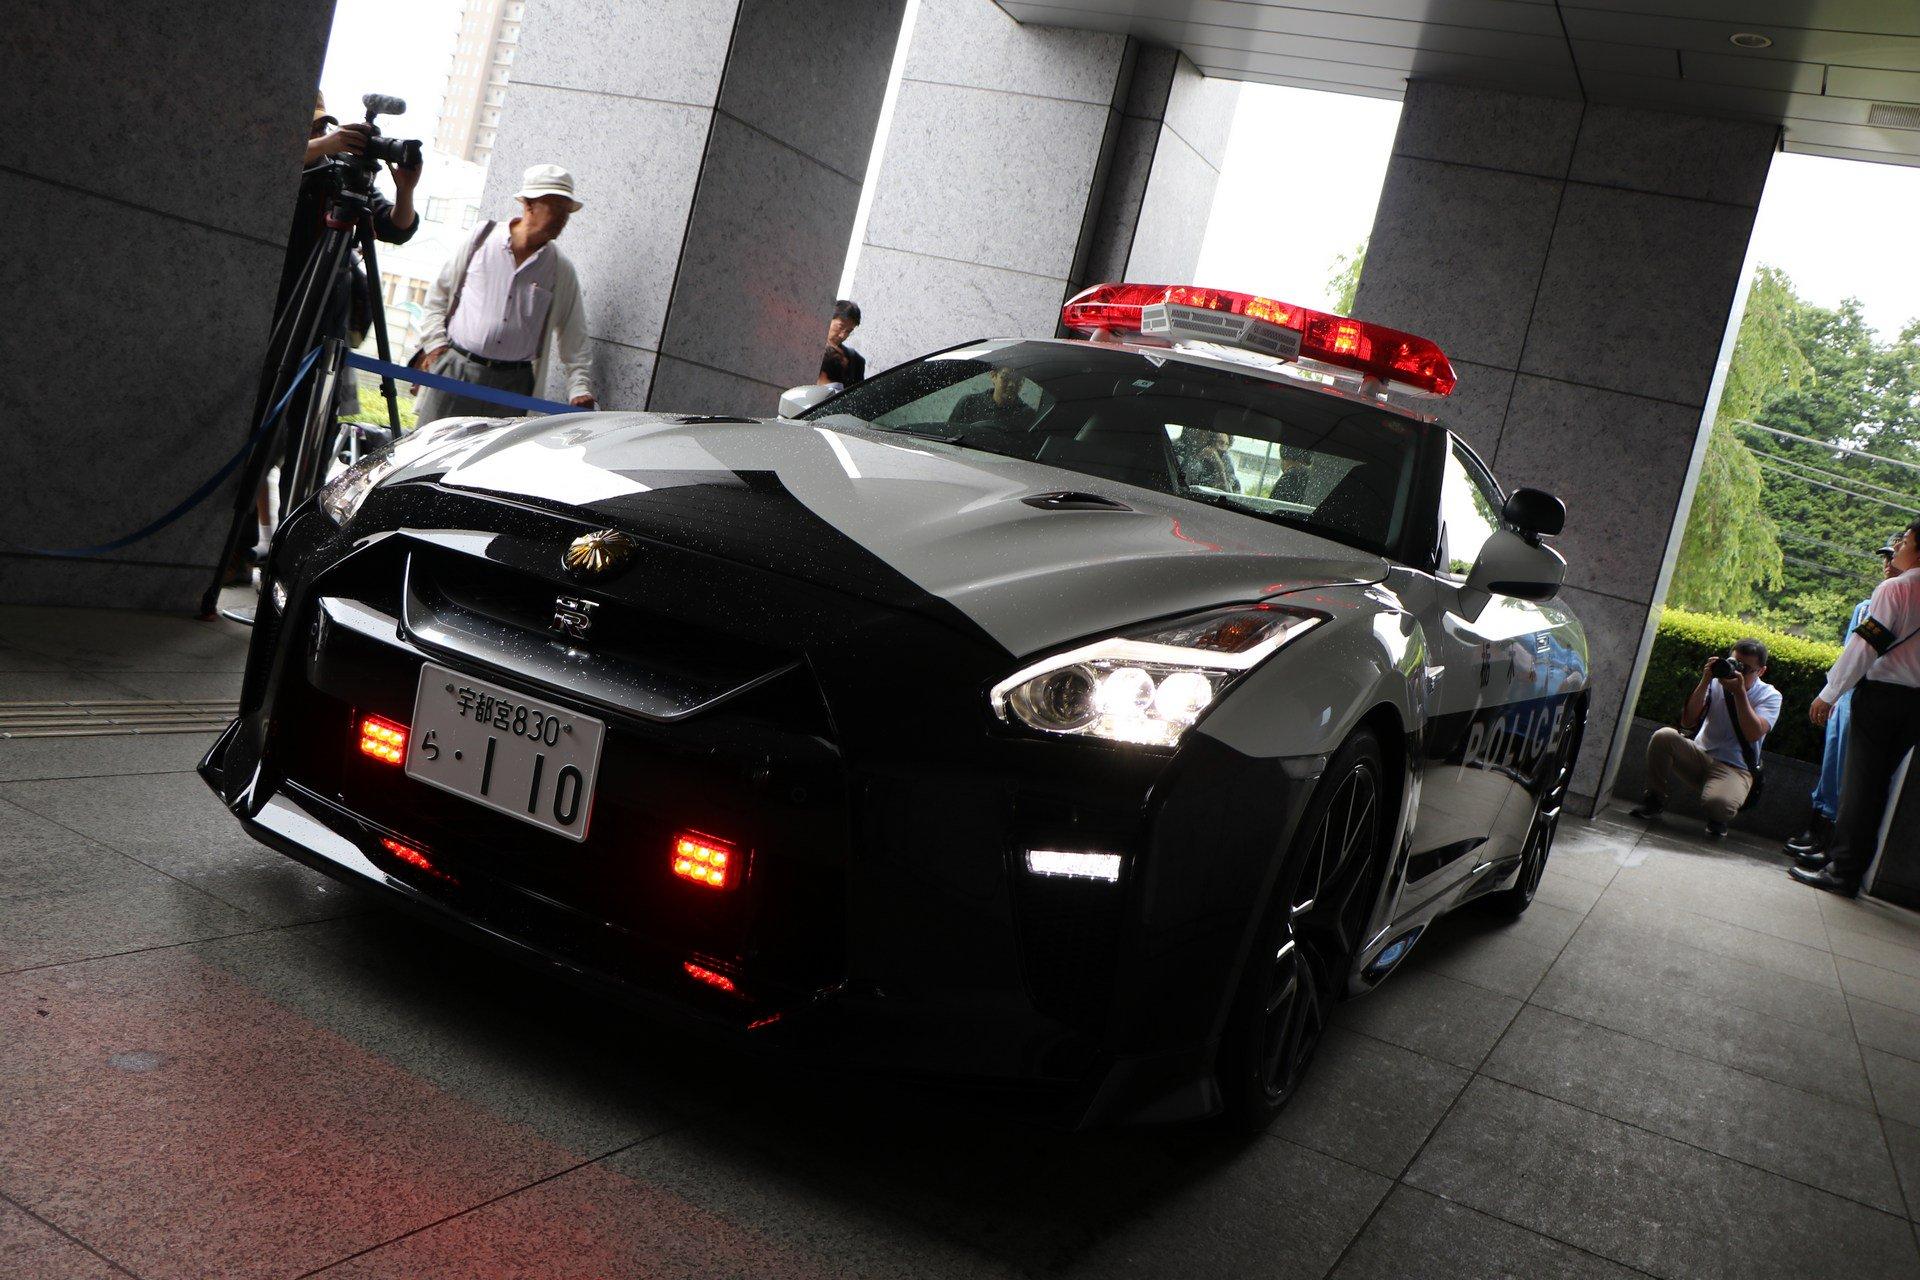 Nissan_GT-R_Police_Car_0008